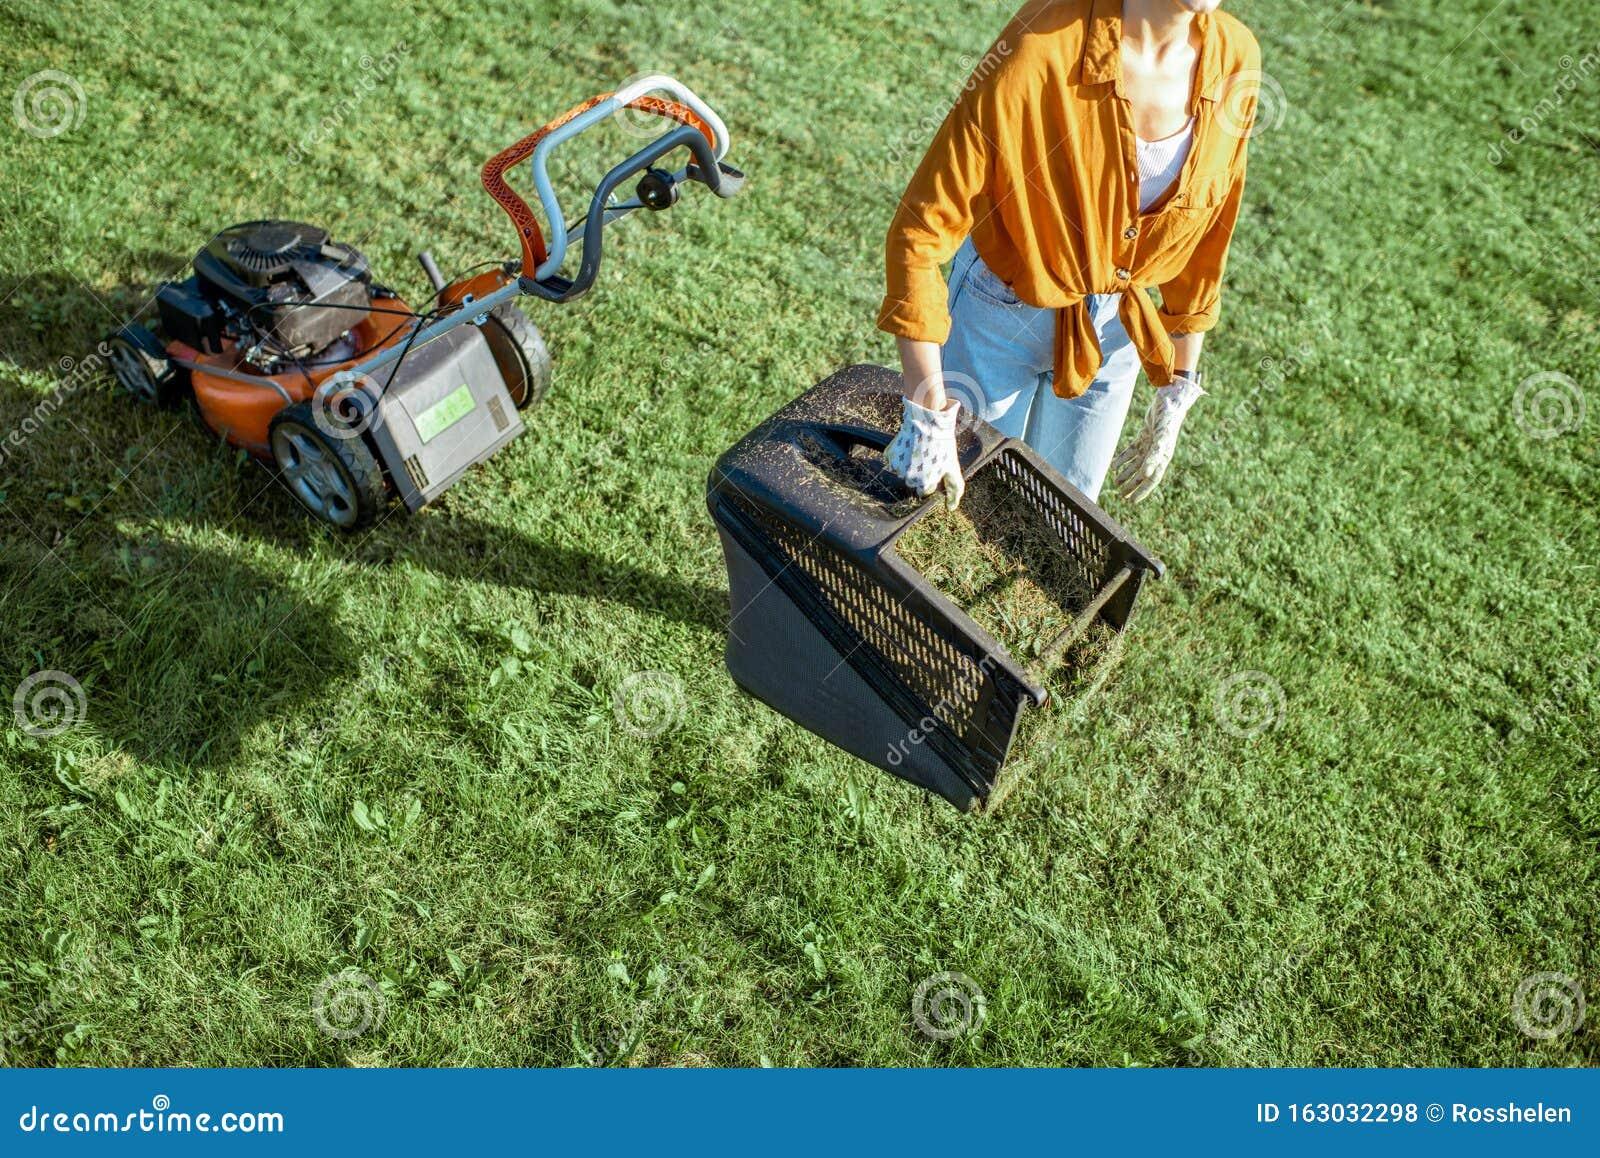 Young Woman Working In Garden Gardening Trimming Grass